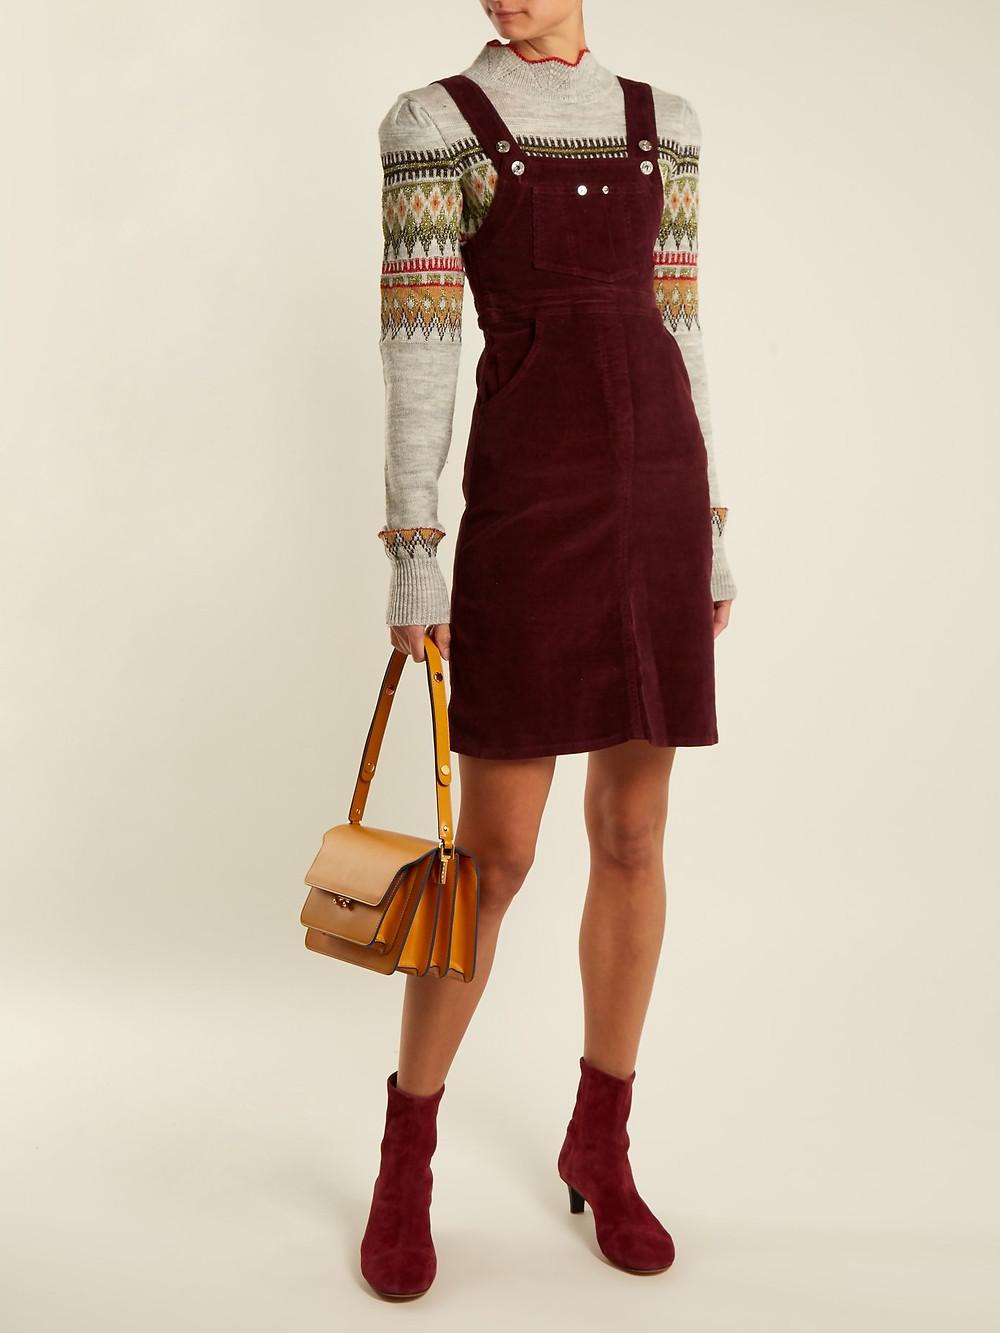 Eve Denim Marianne corduroy dress $204